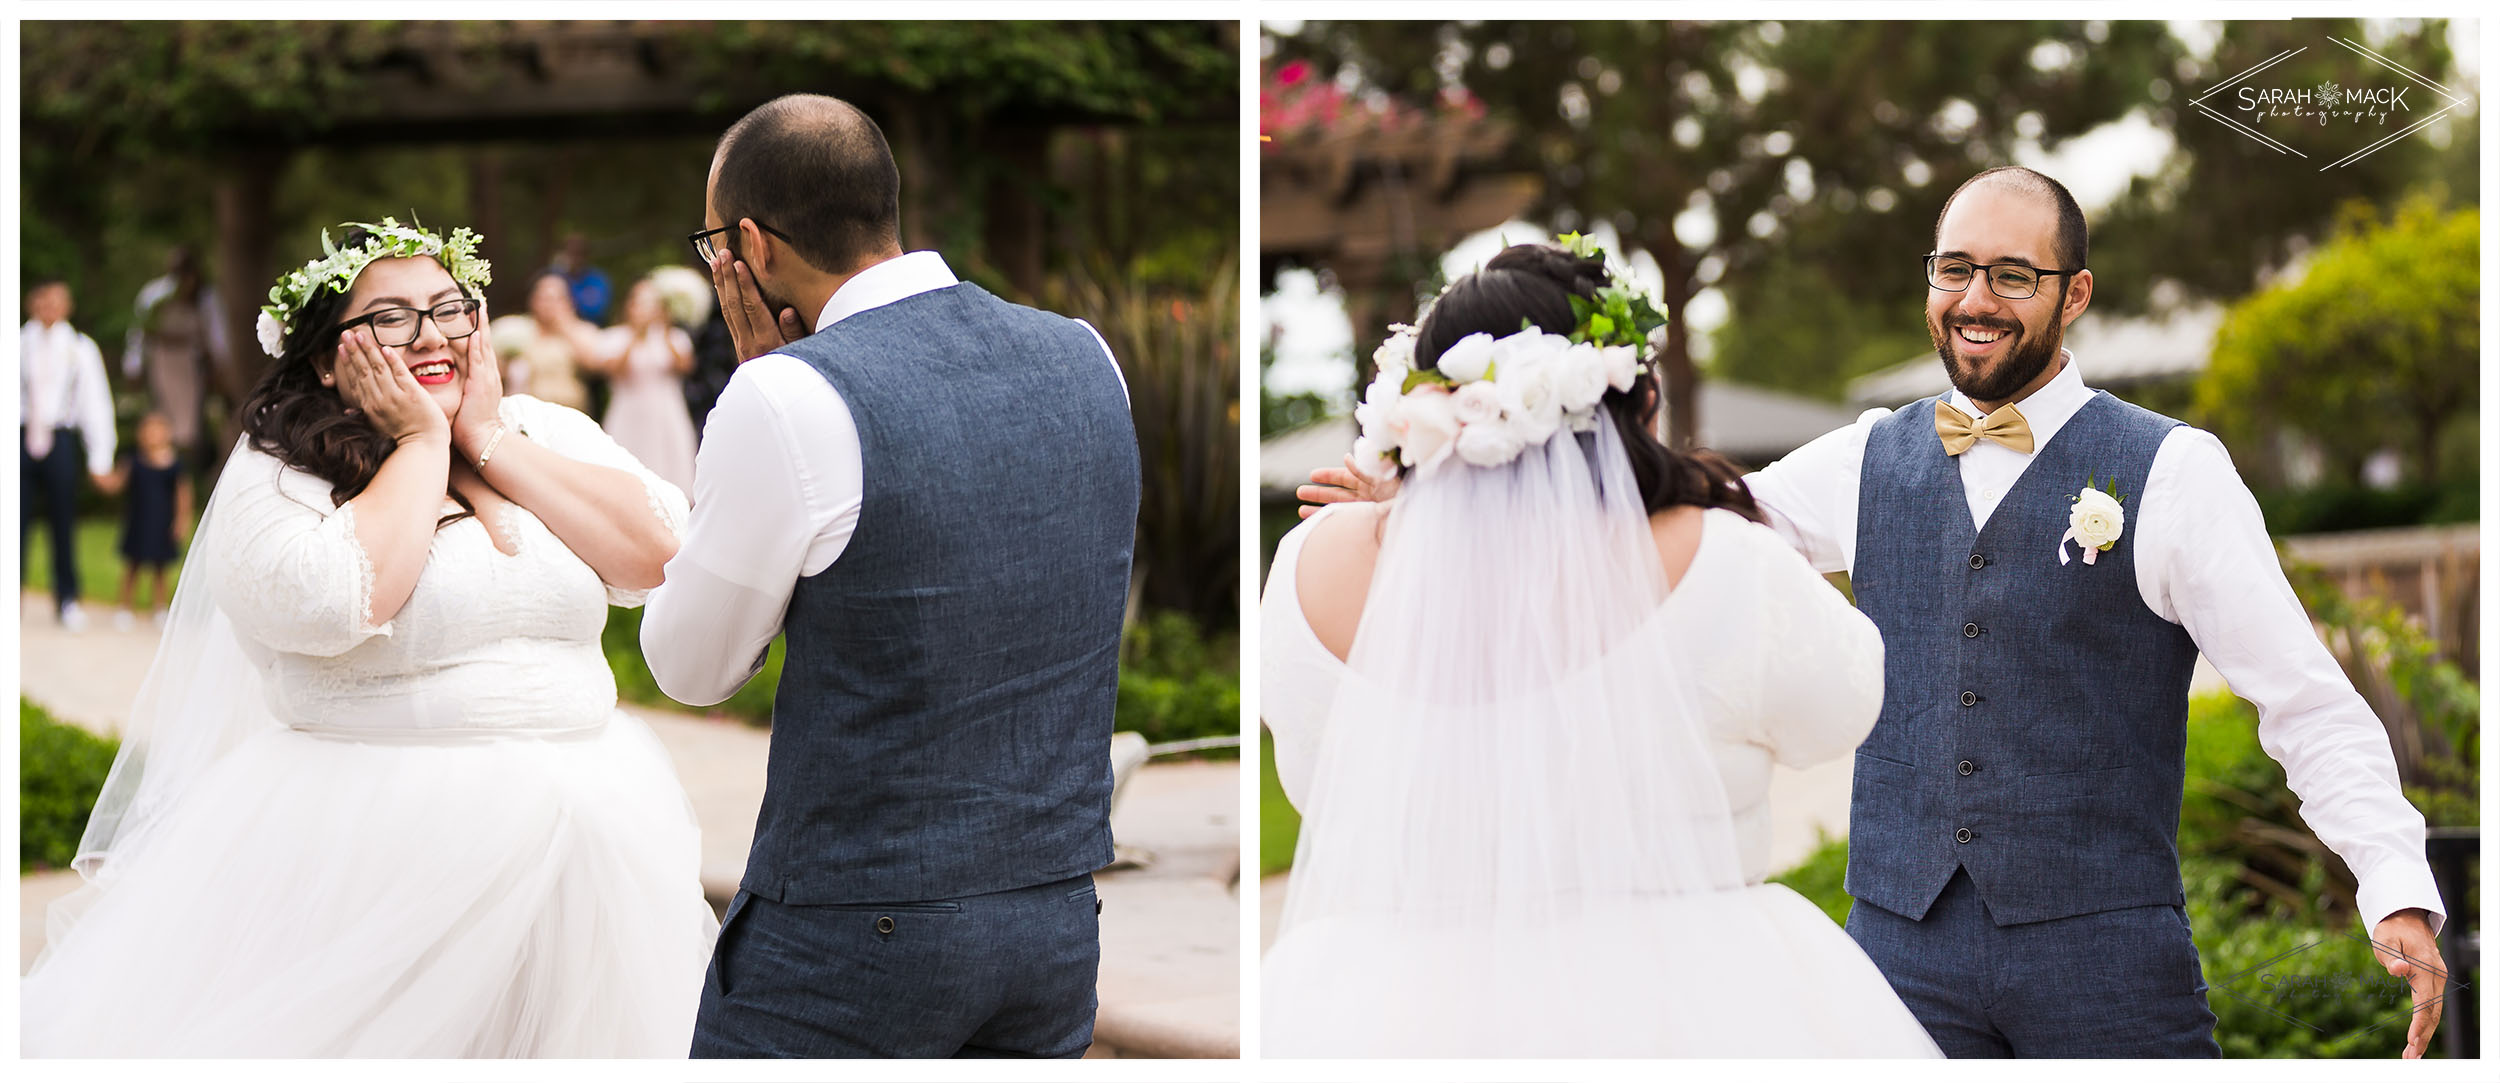 CK-Eureka-Building-Irvine-Wedding-16.jpg